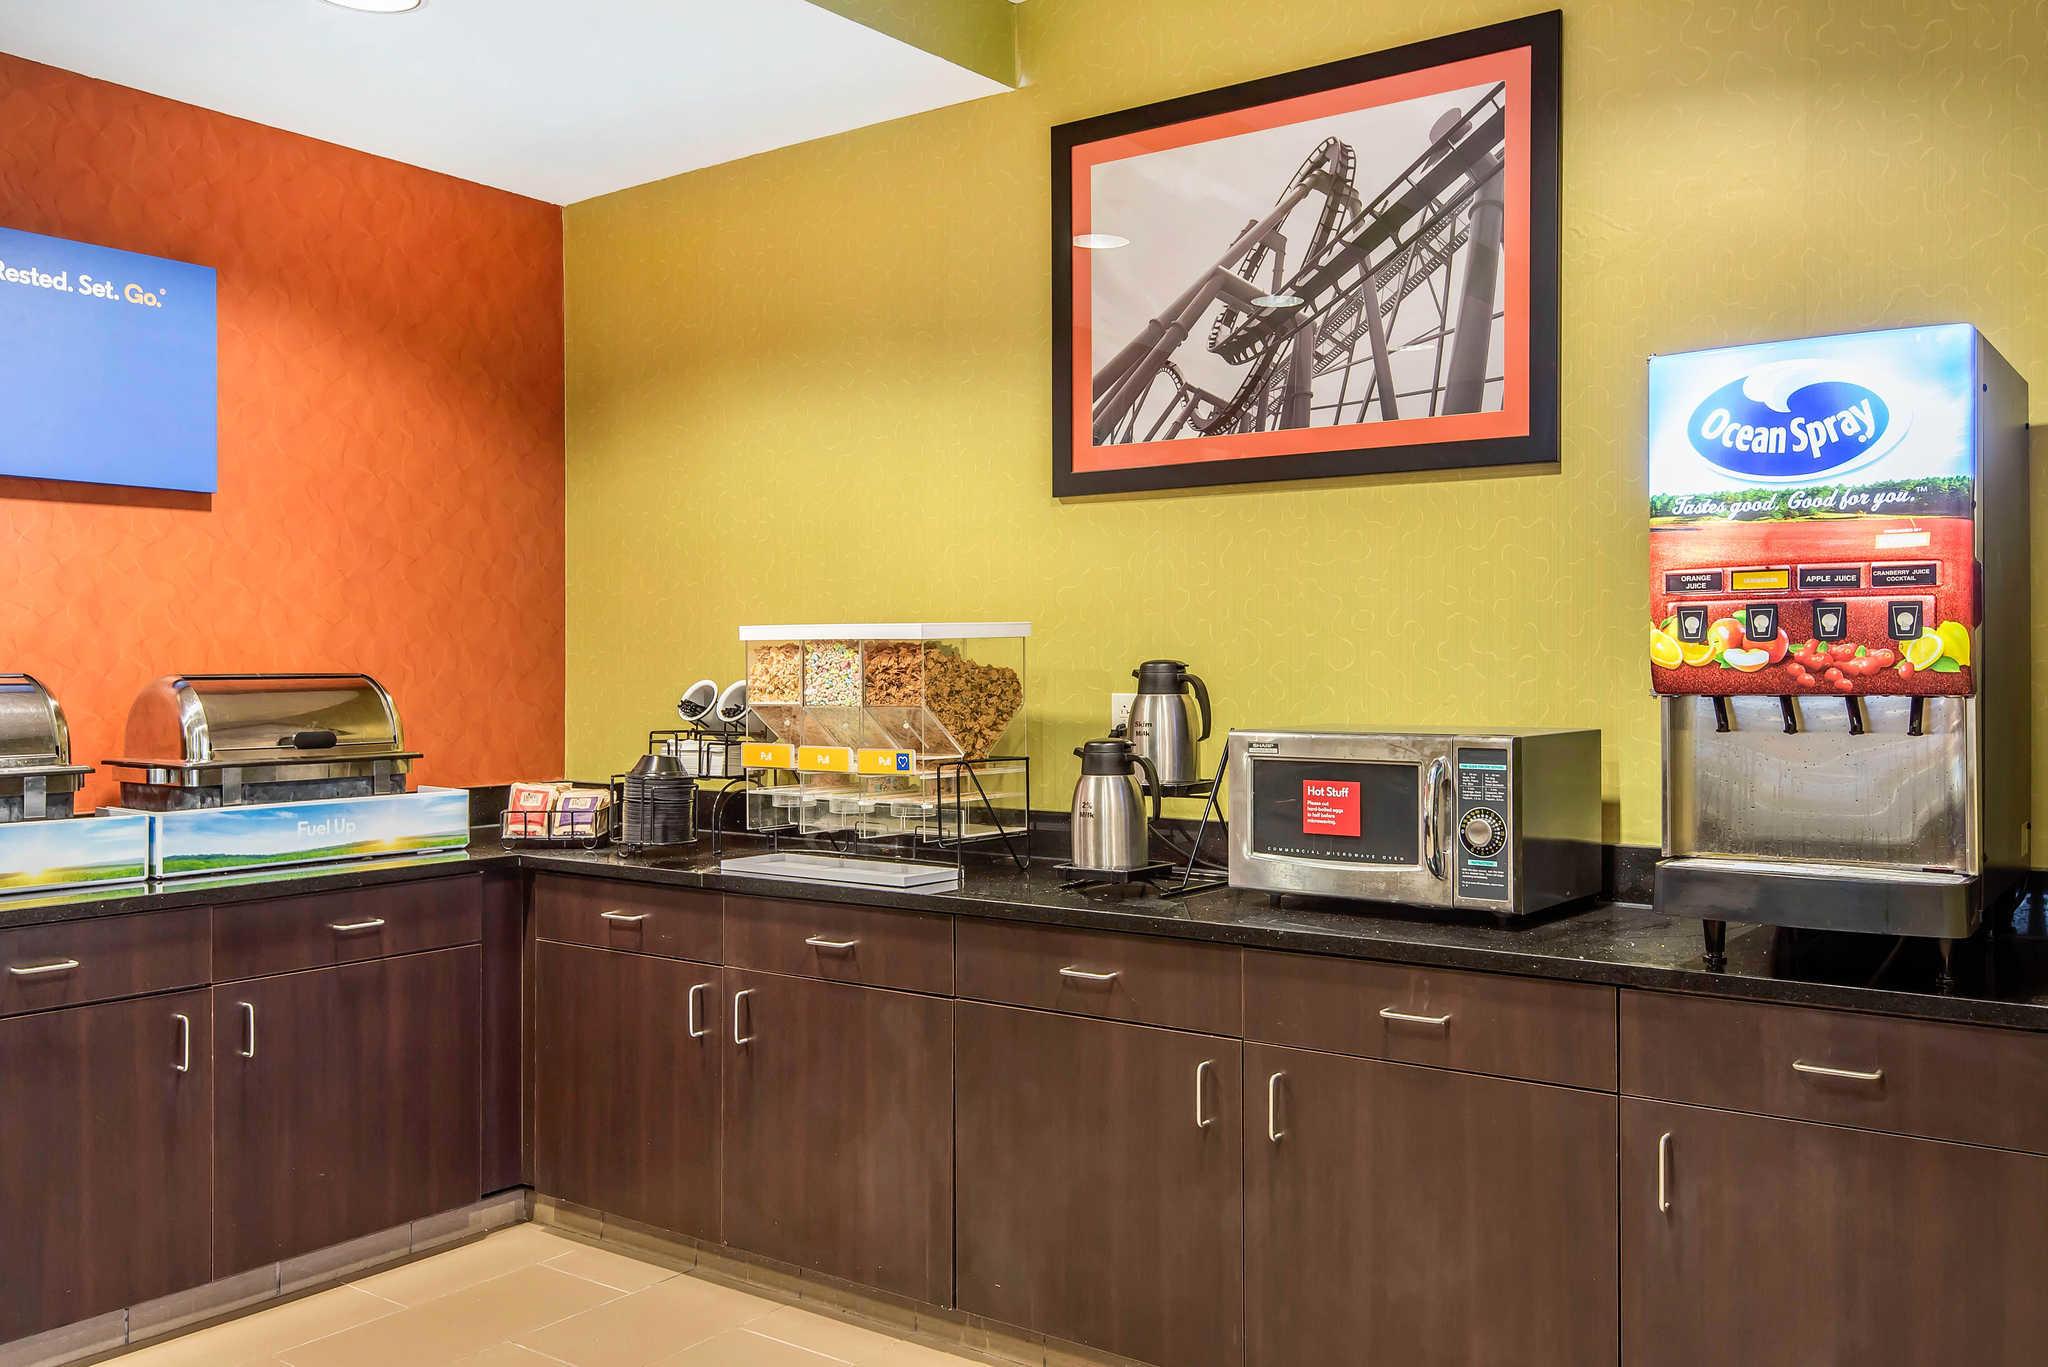 Comfort Inn & Suites Kansas City - Northeast image 23